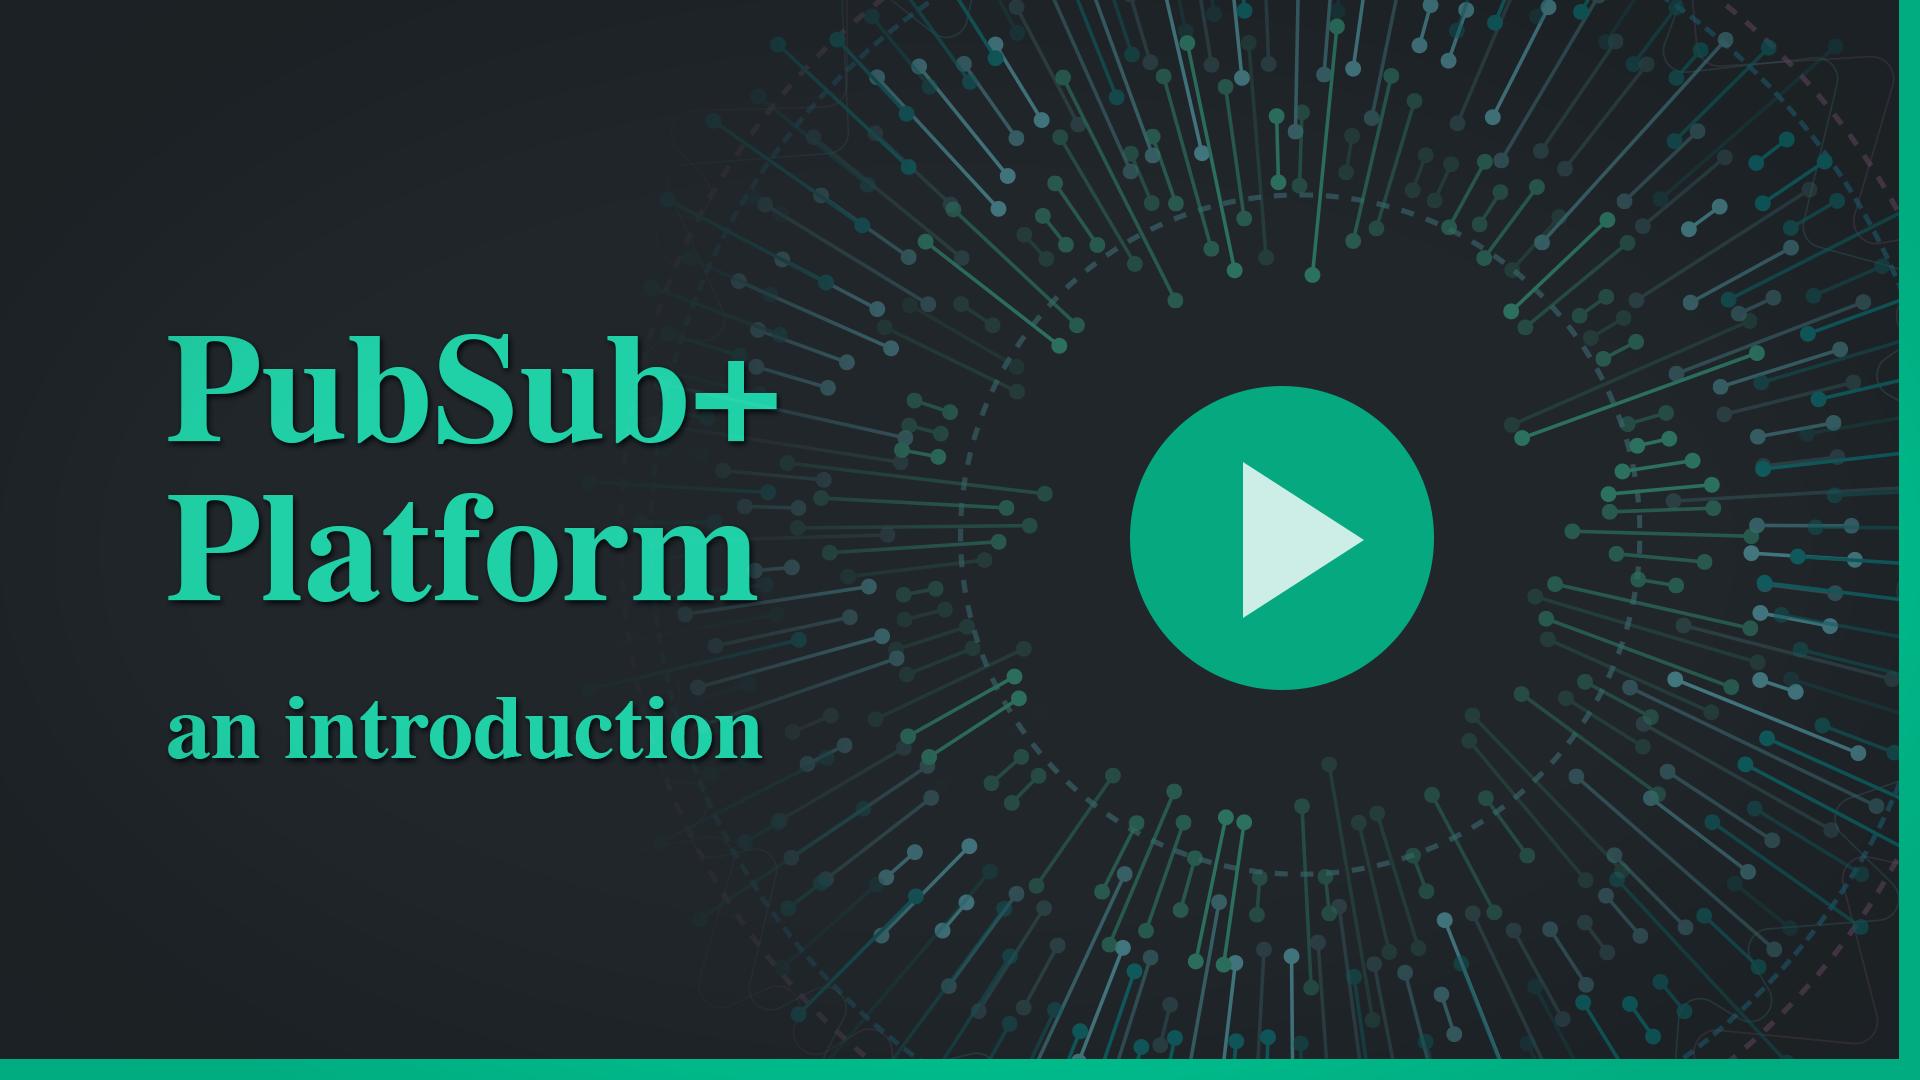 PubSub+ Platform